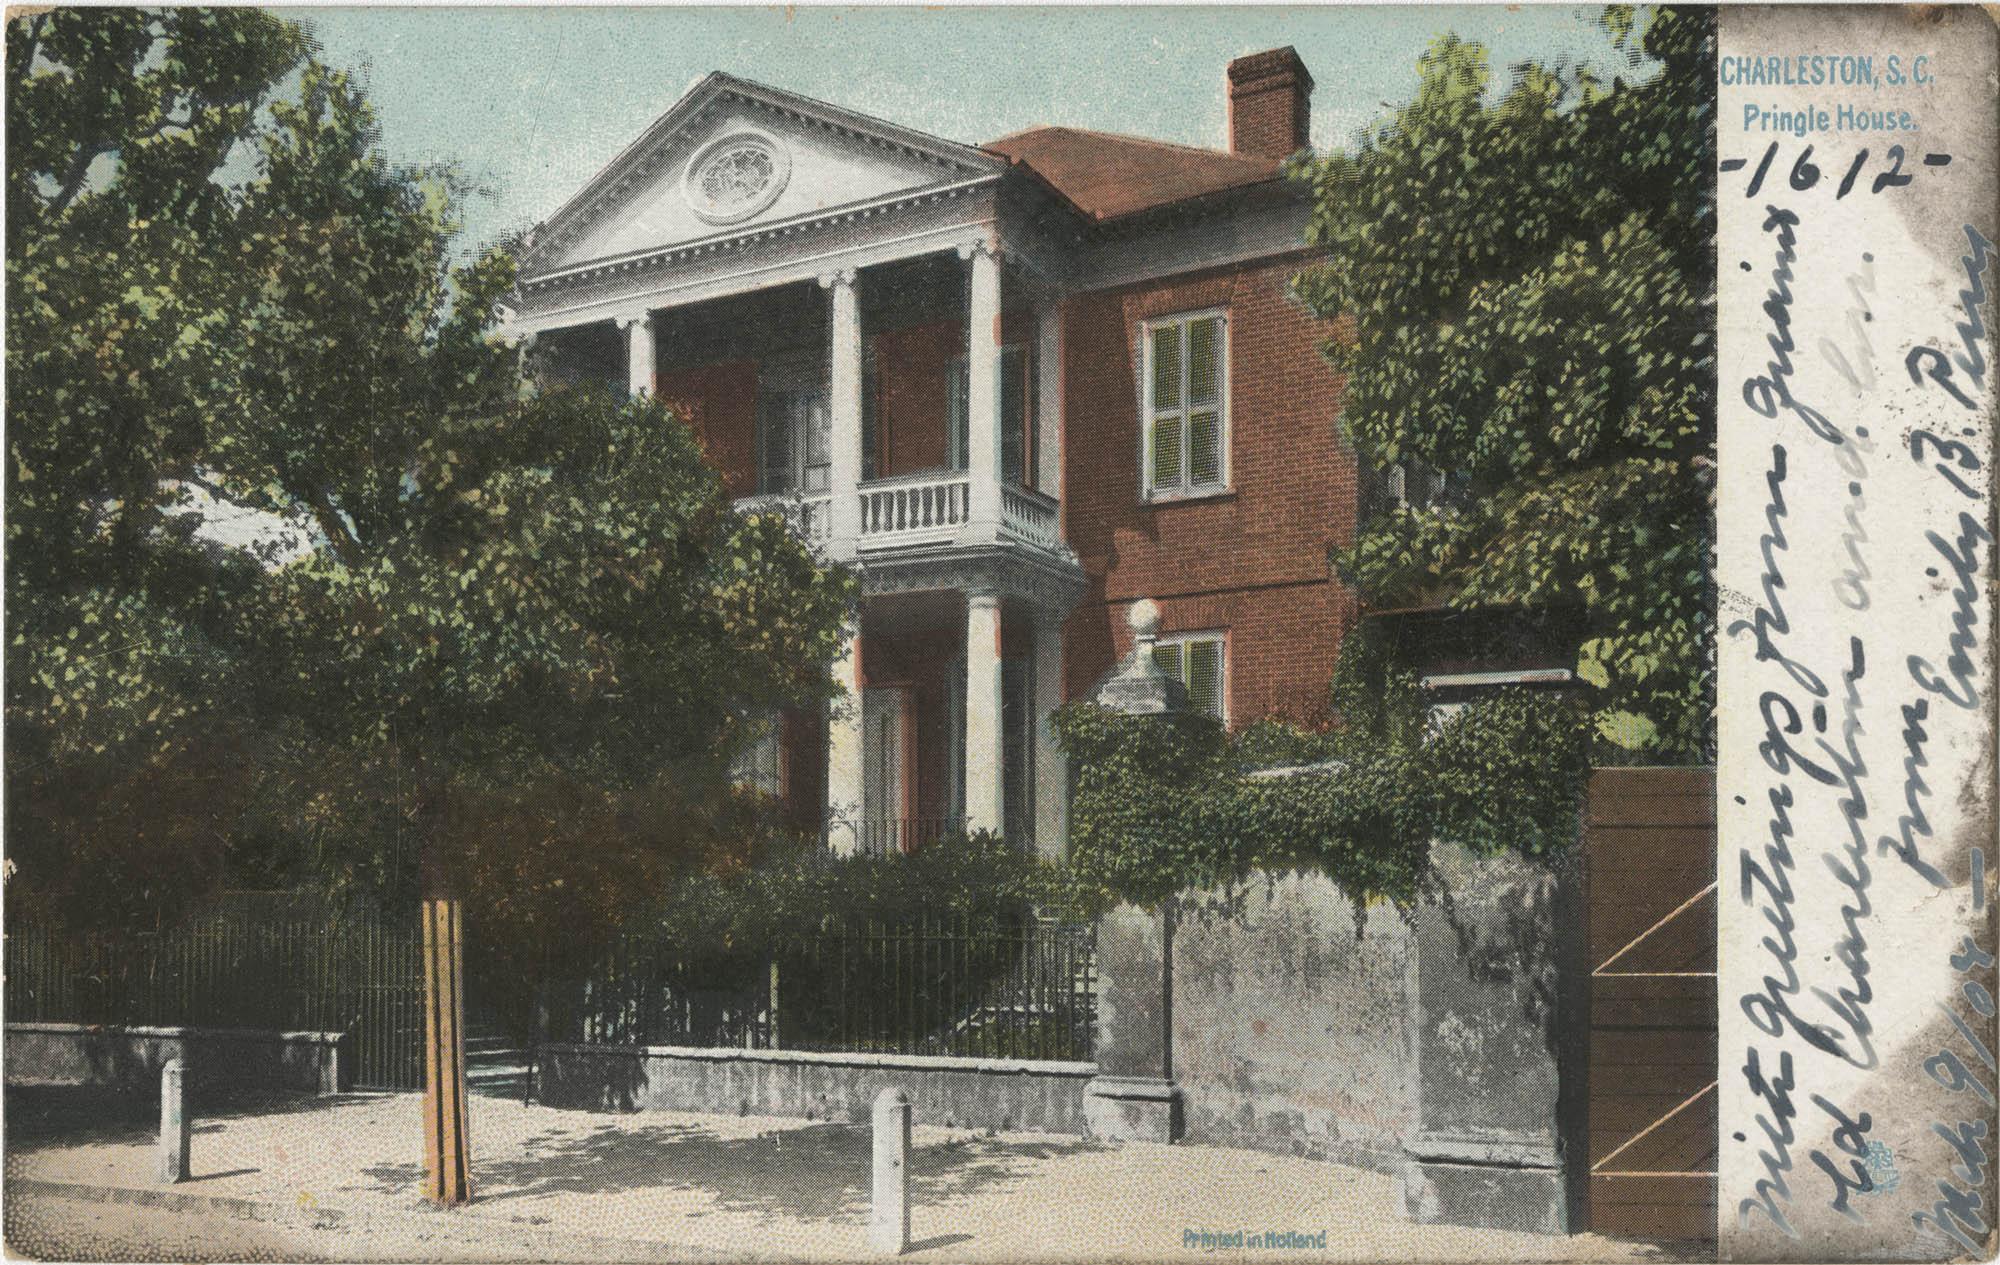 Charleston, S.C. Pringle House